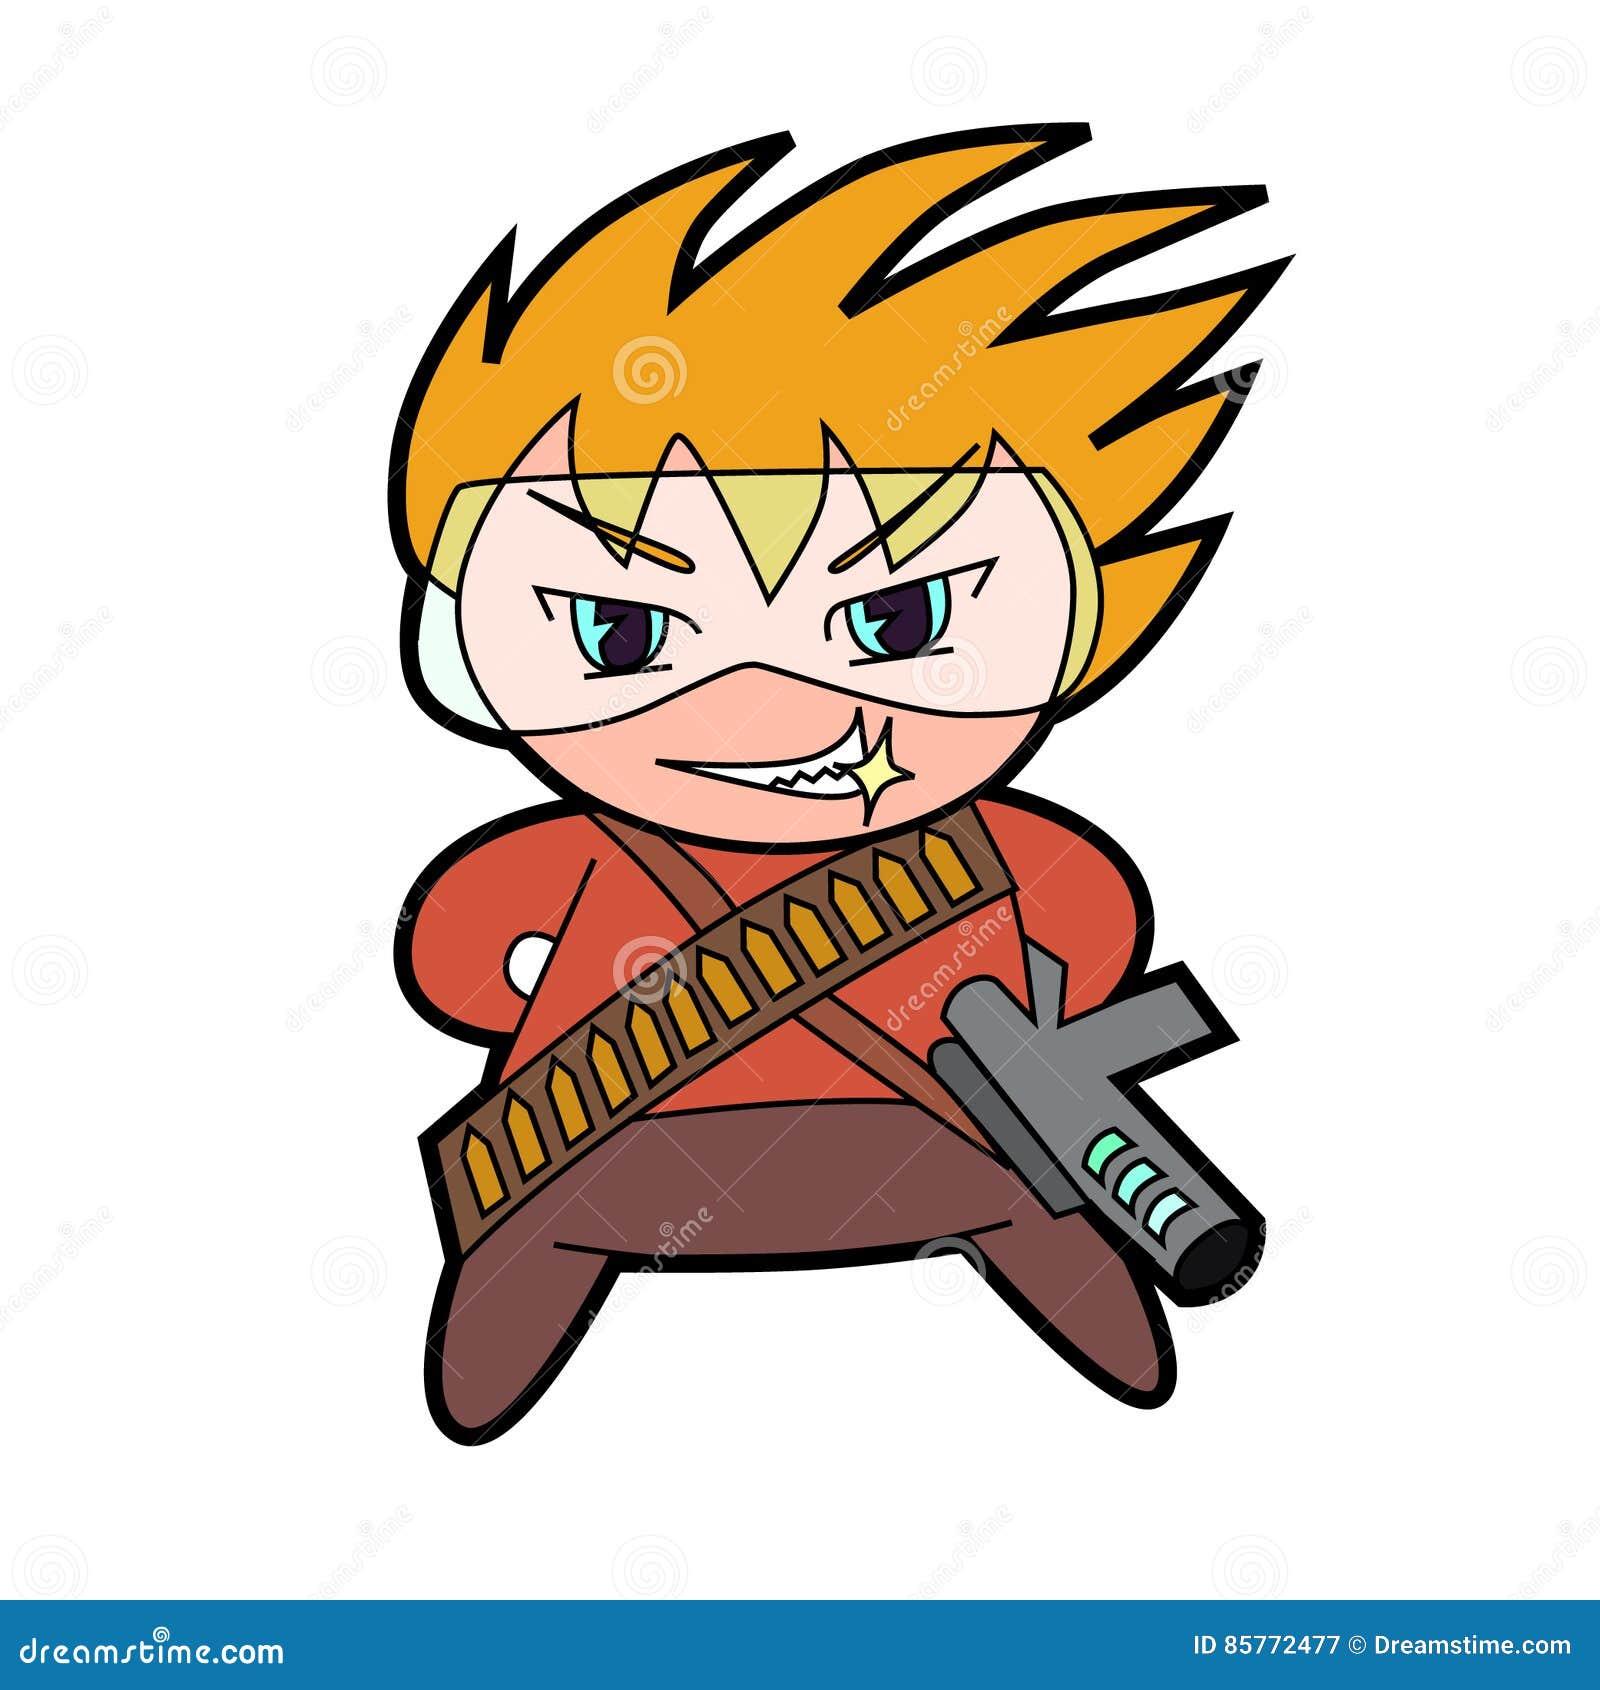 Military chibi boy character